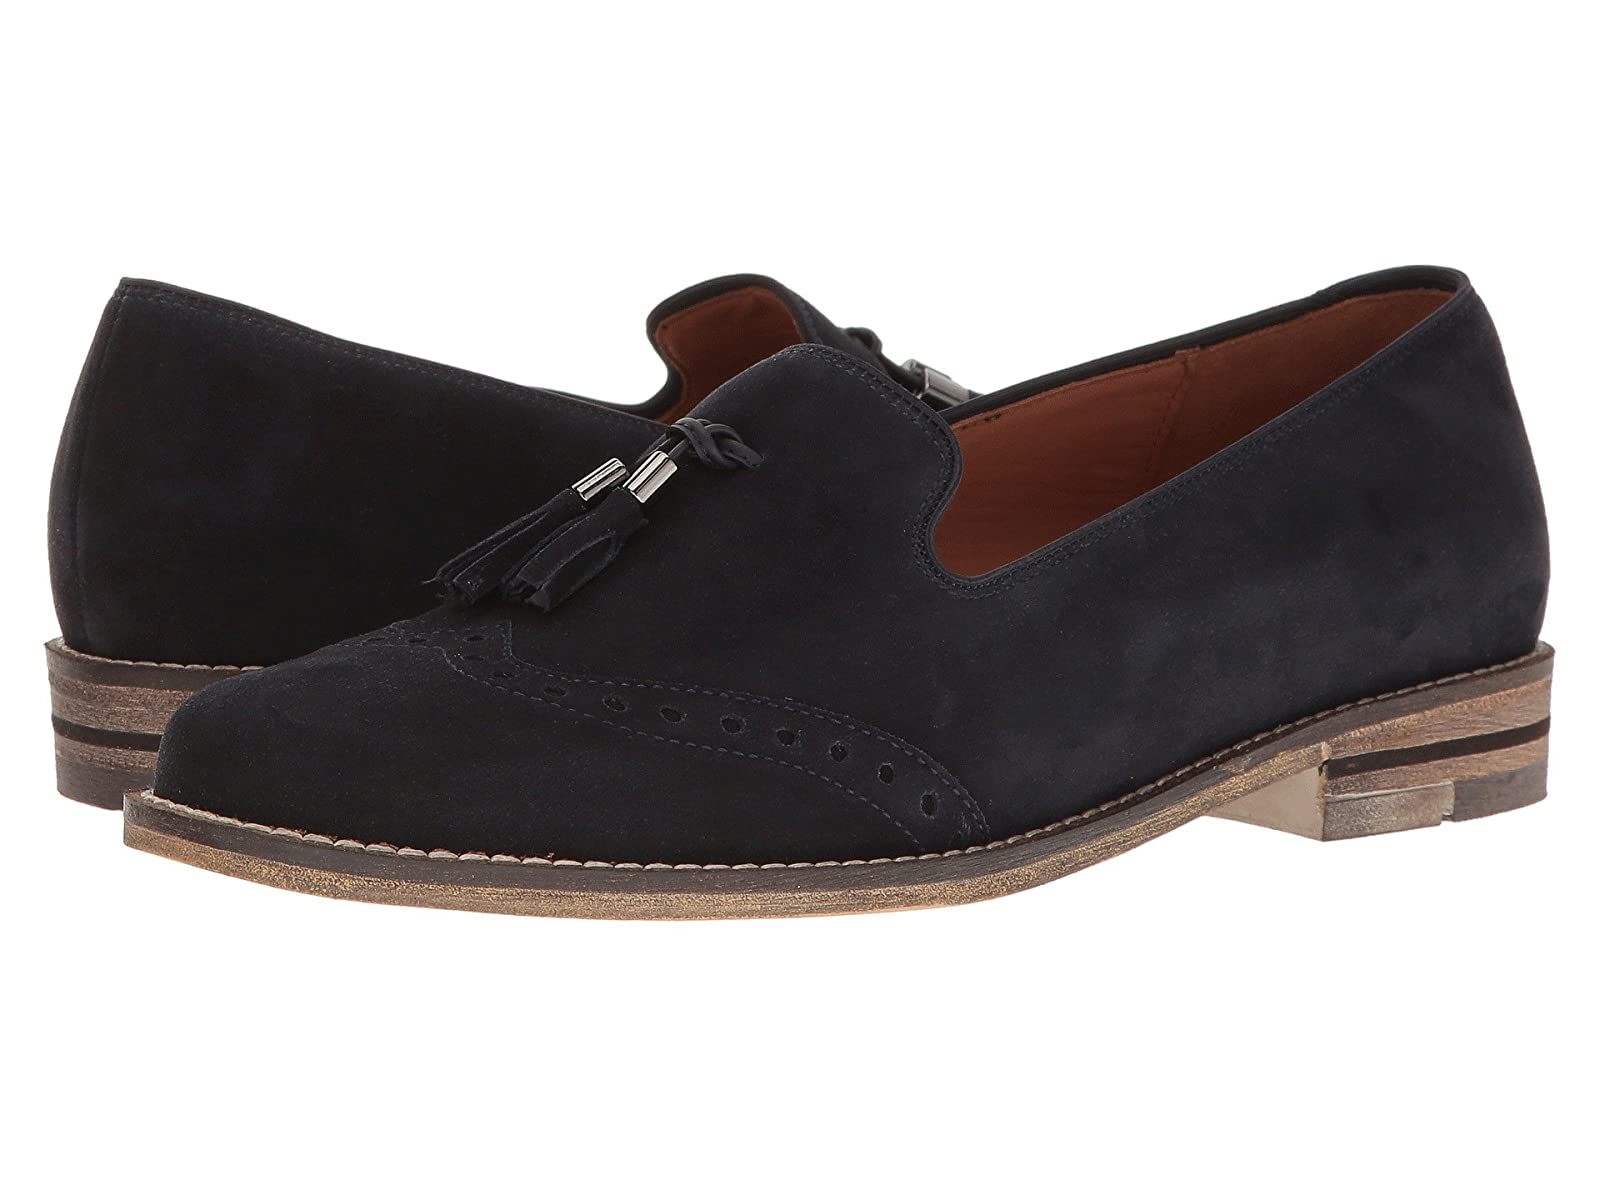 ara KayCheap and distinctive eye-catching shoes